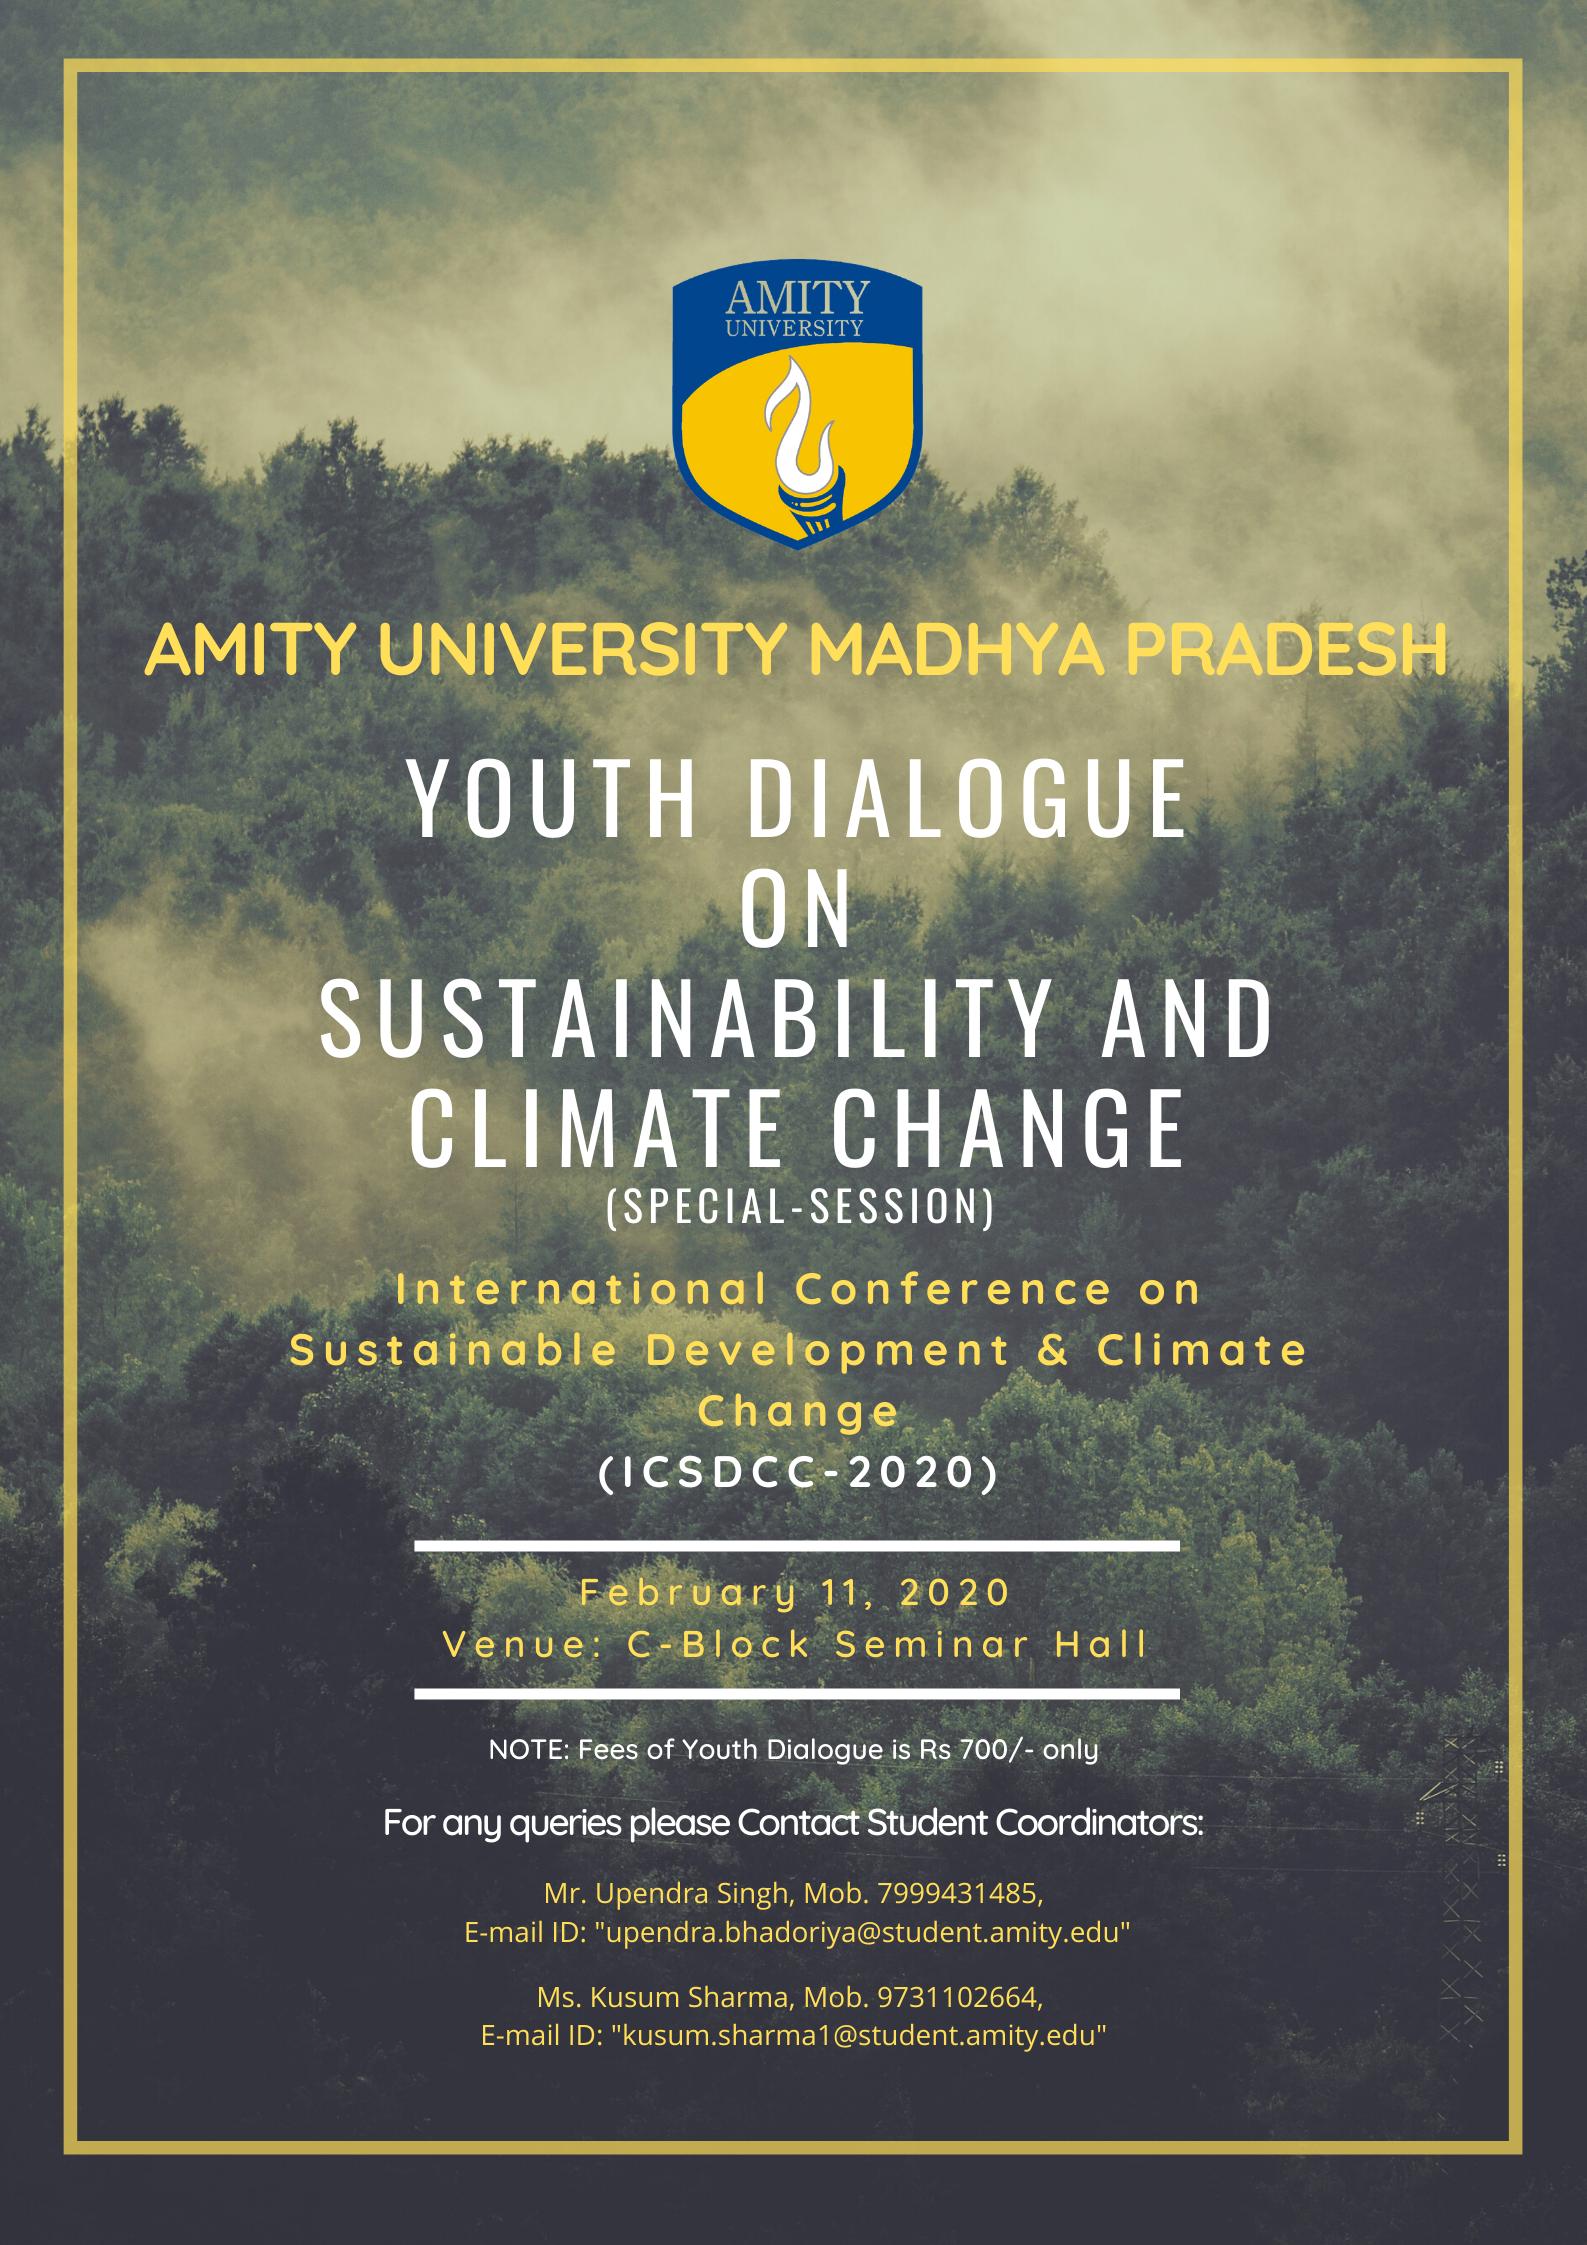 Conference on Sustainable Development & Climate Change at Amity University Madhya Pradesh, Gwalior